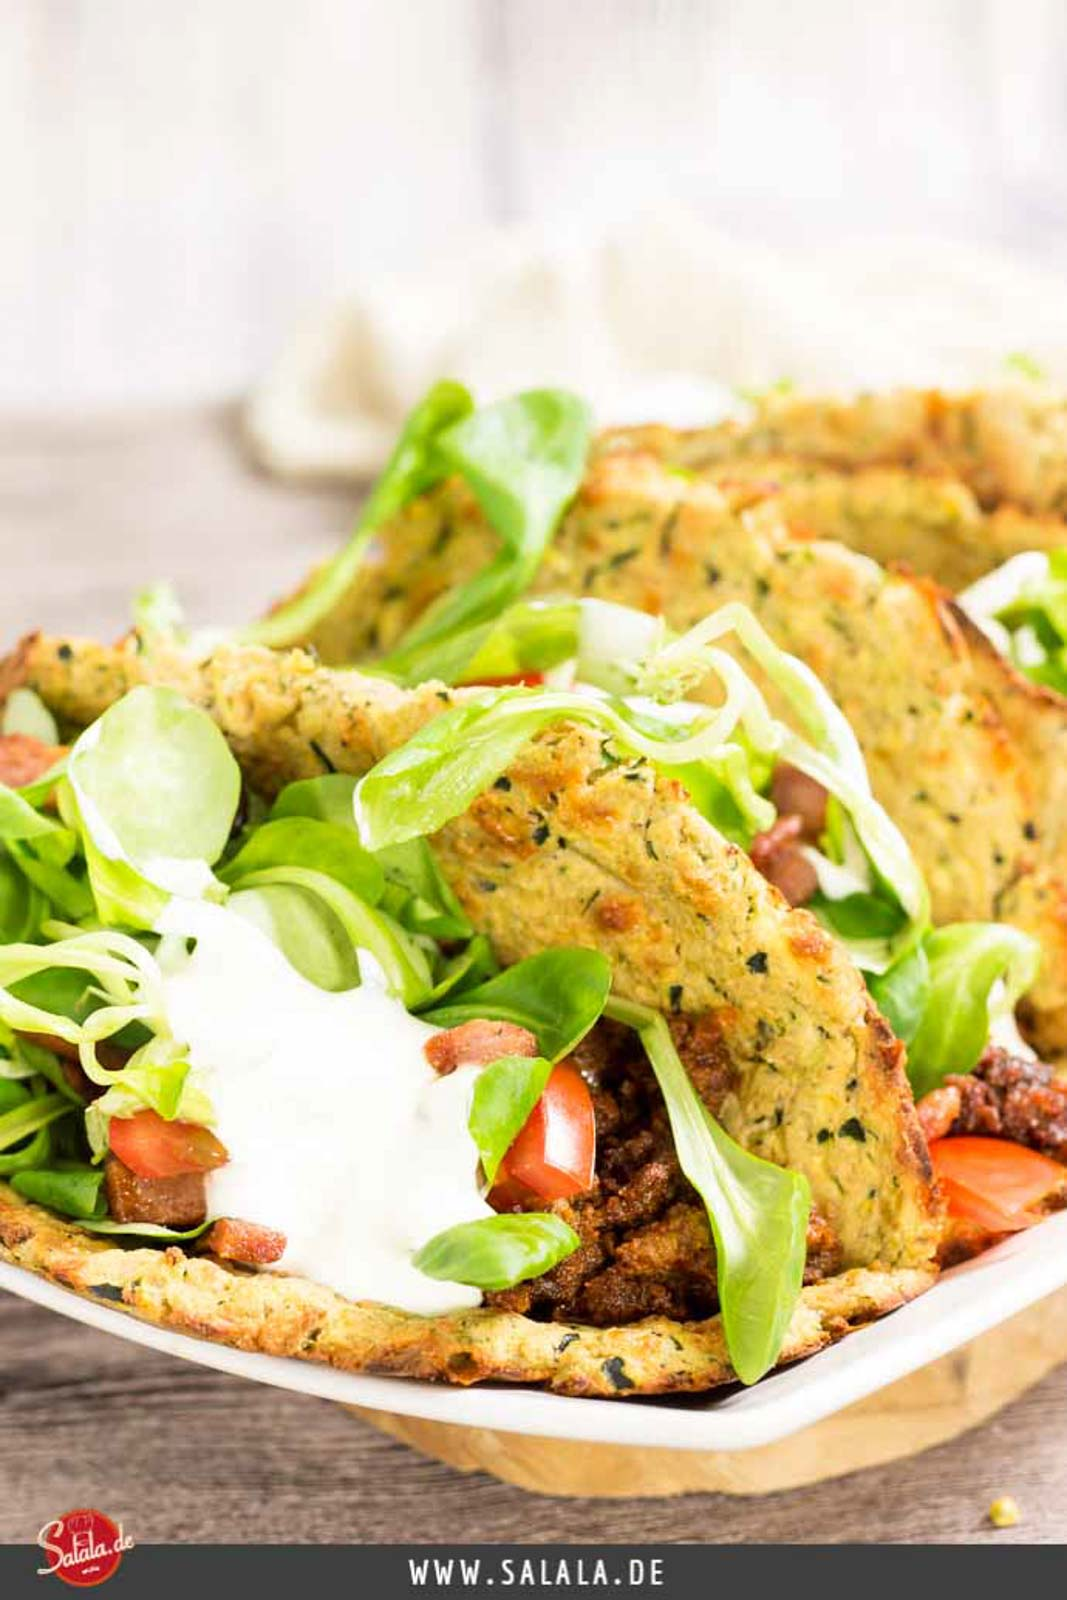 weiche Zucchini Taco Shells - by salala.de - Rezept ohne Mehl Low Carb glutenfrei selbst gemacht